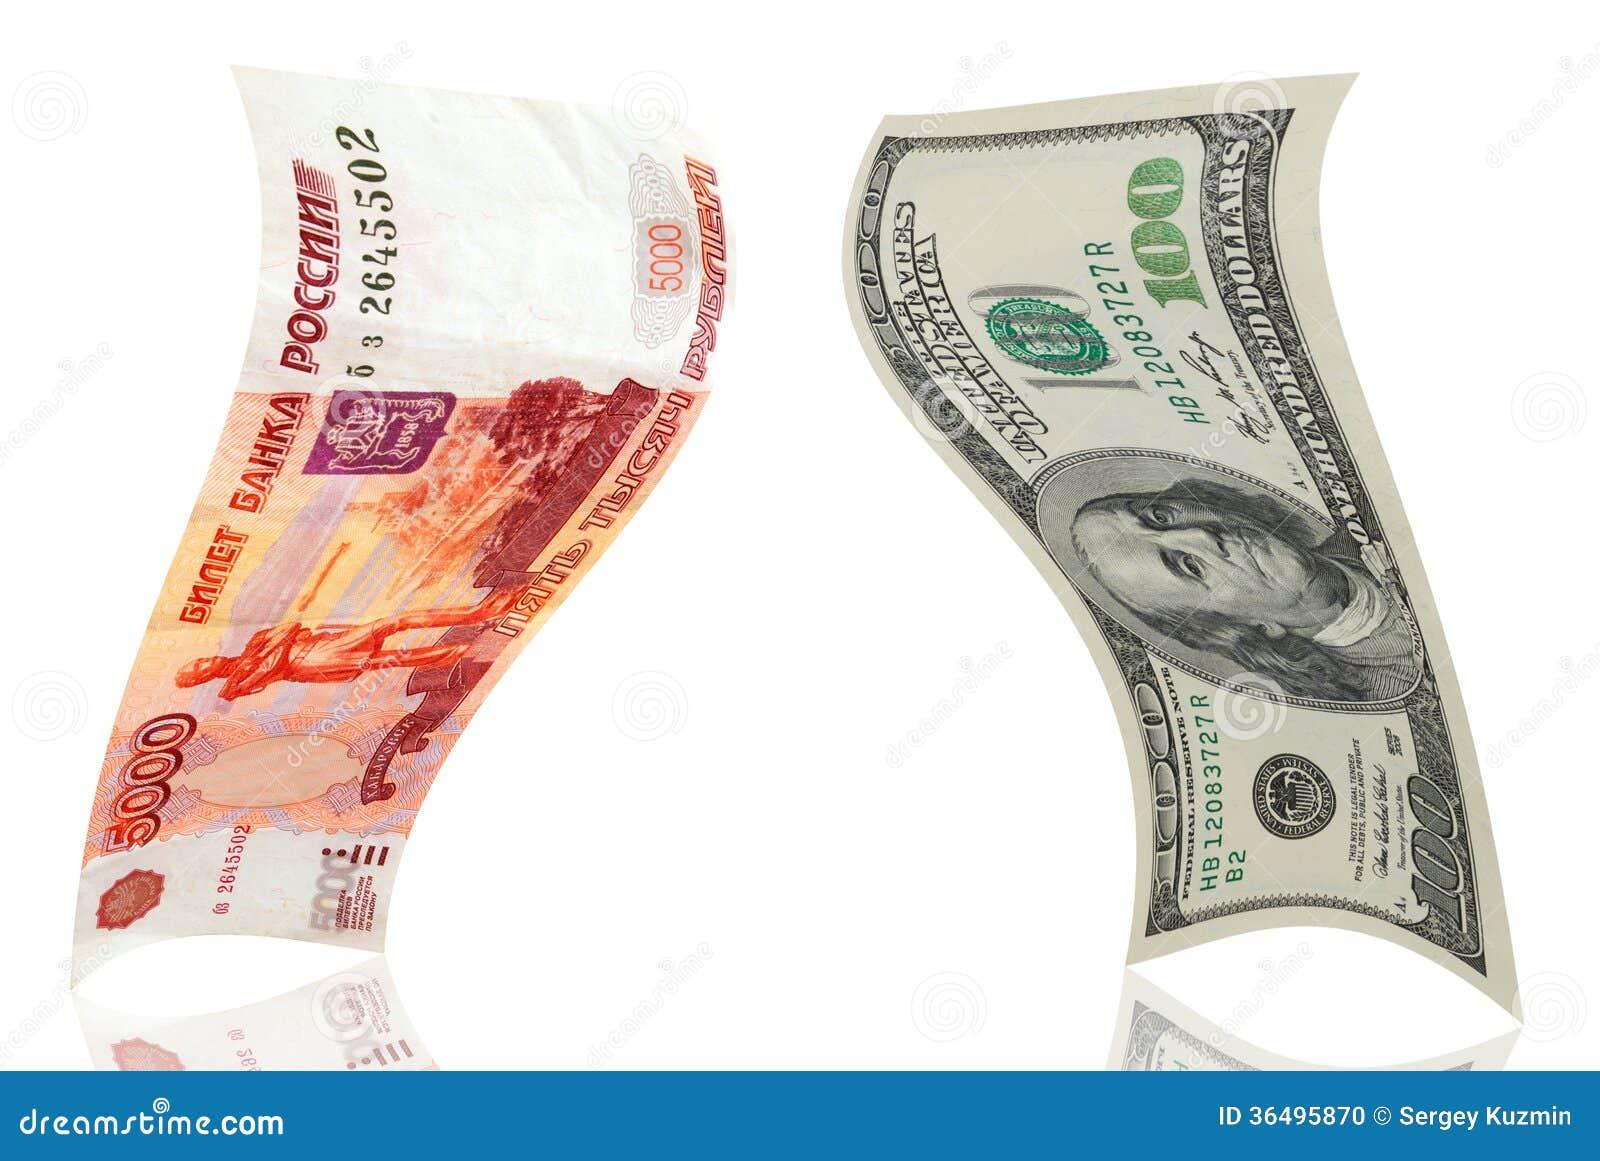 Comerț US Dollar / Russian Ruble CFD